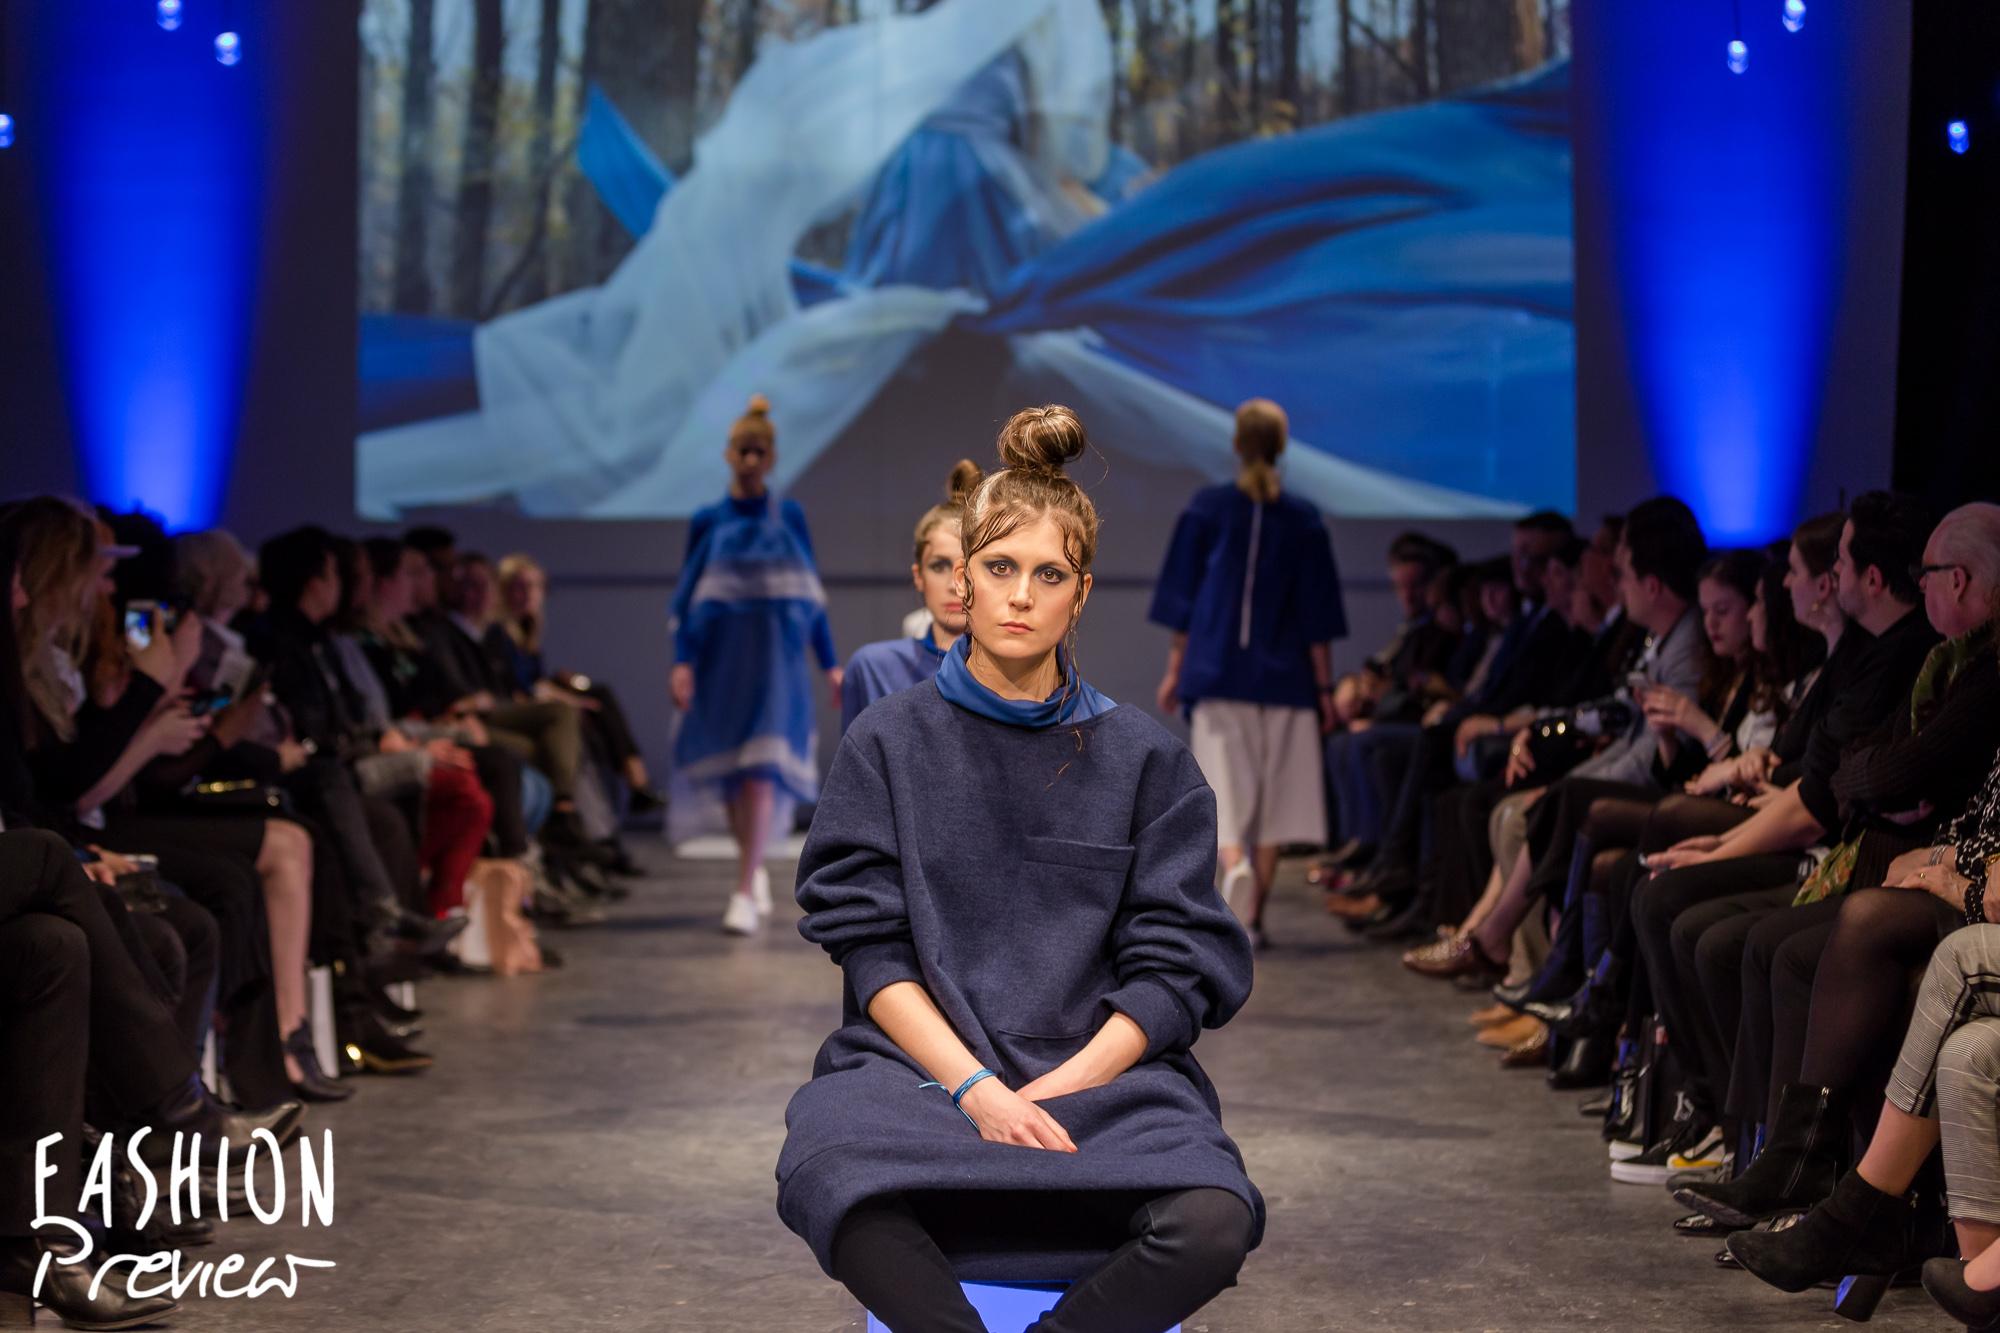 Fashion Preview 9 - Cegep Marie Victorin-15.jpg